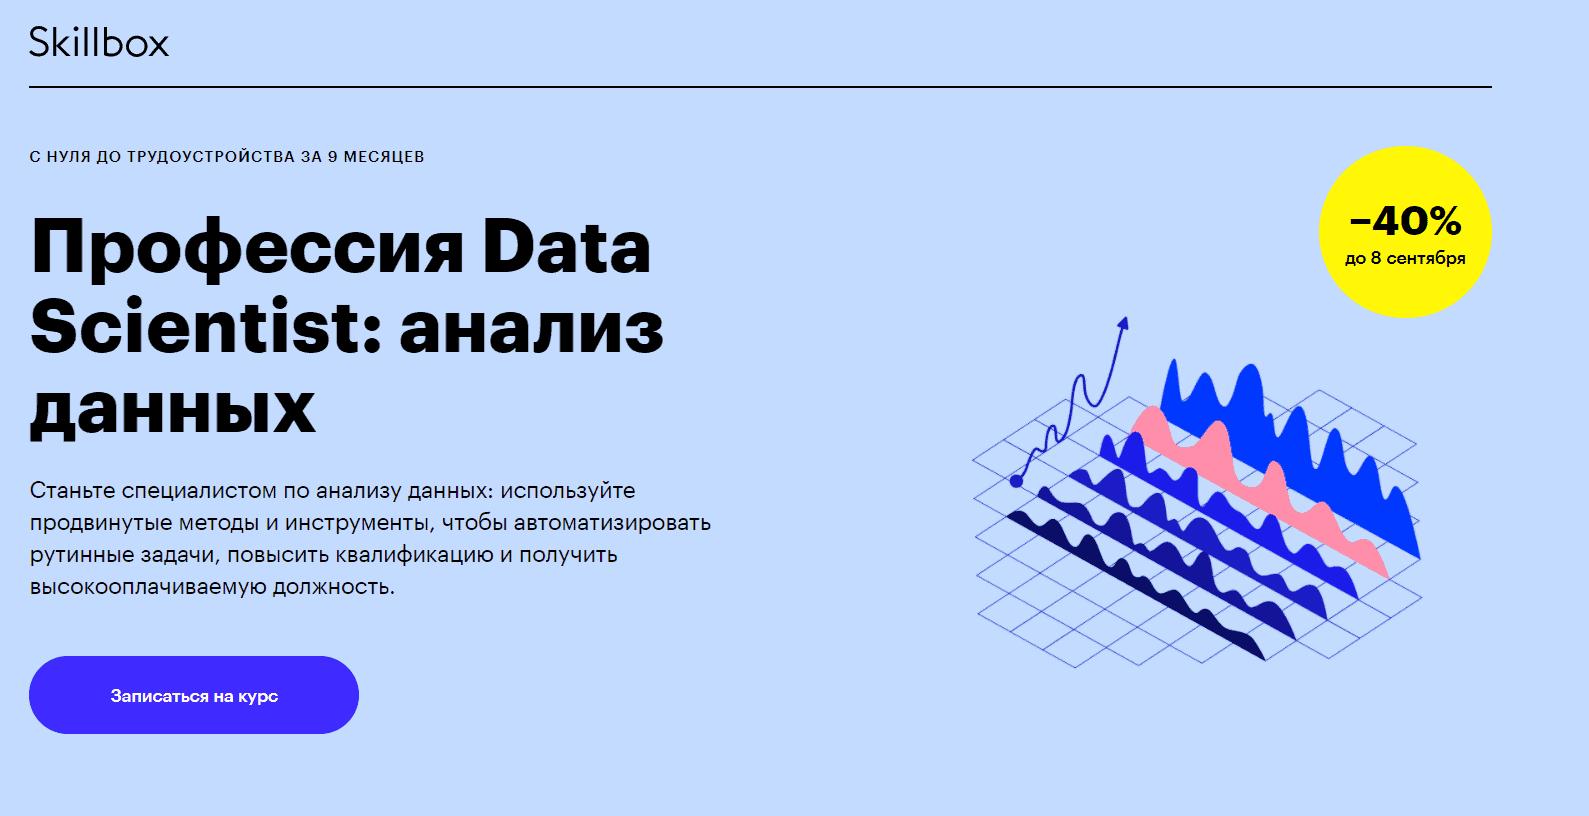 Data Scientist: анализ данных от Skillbox